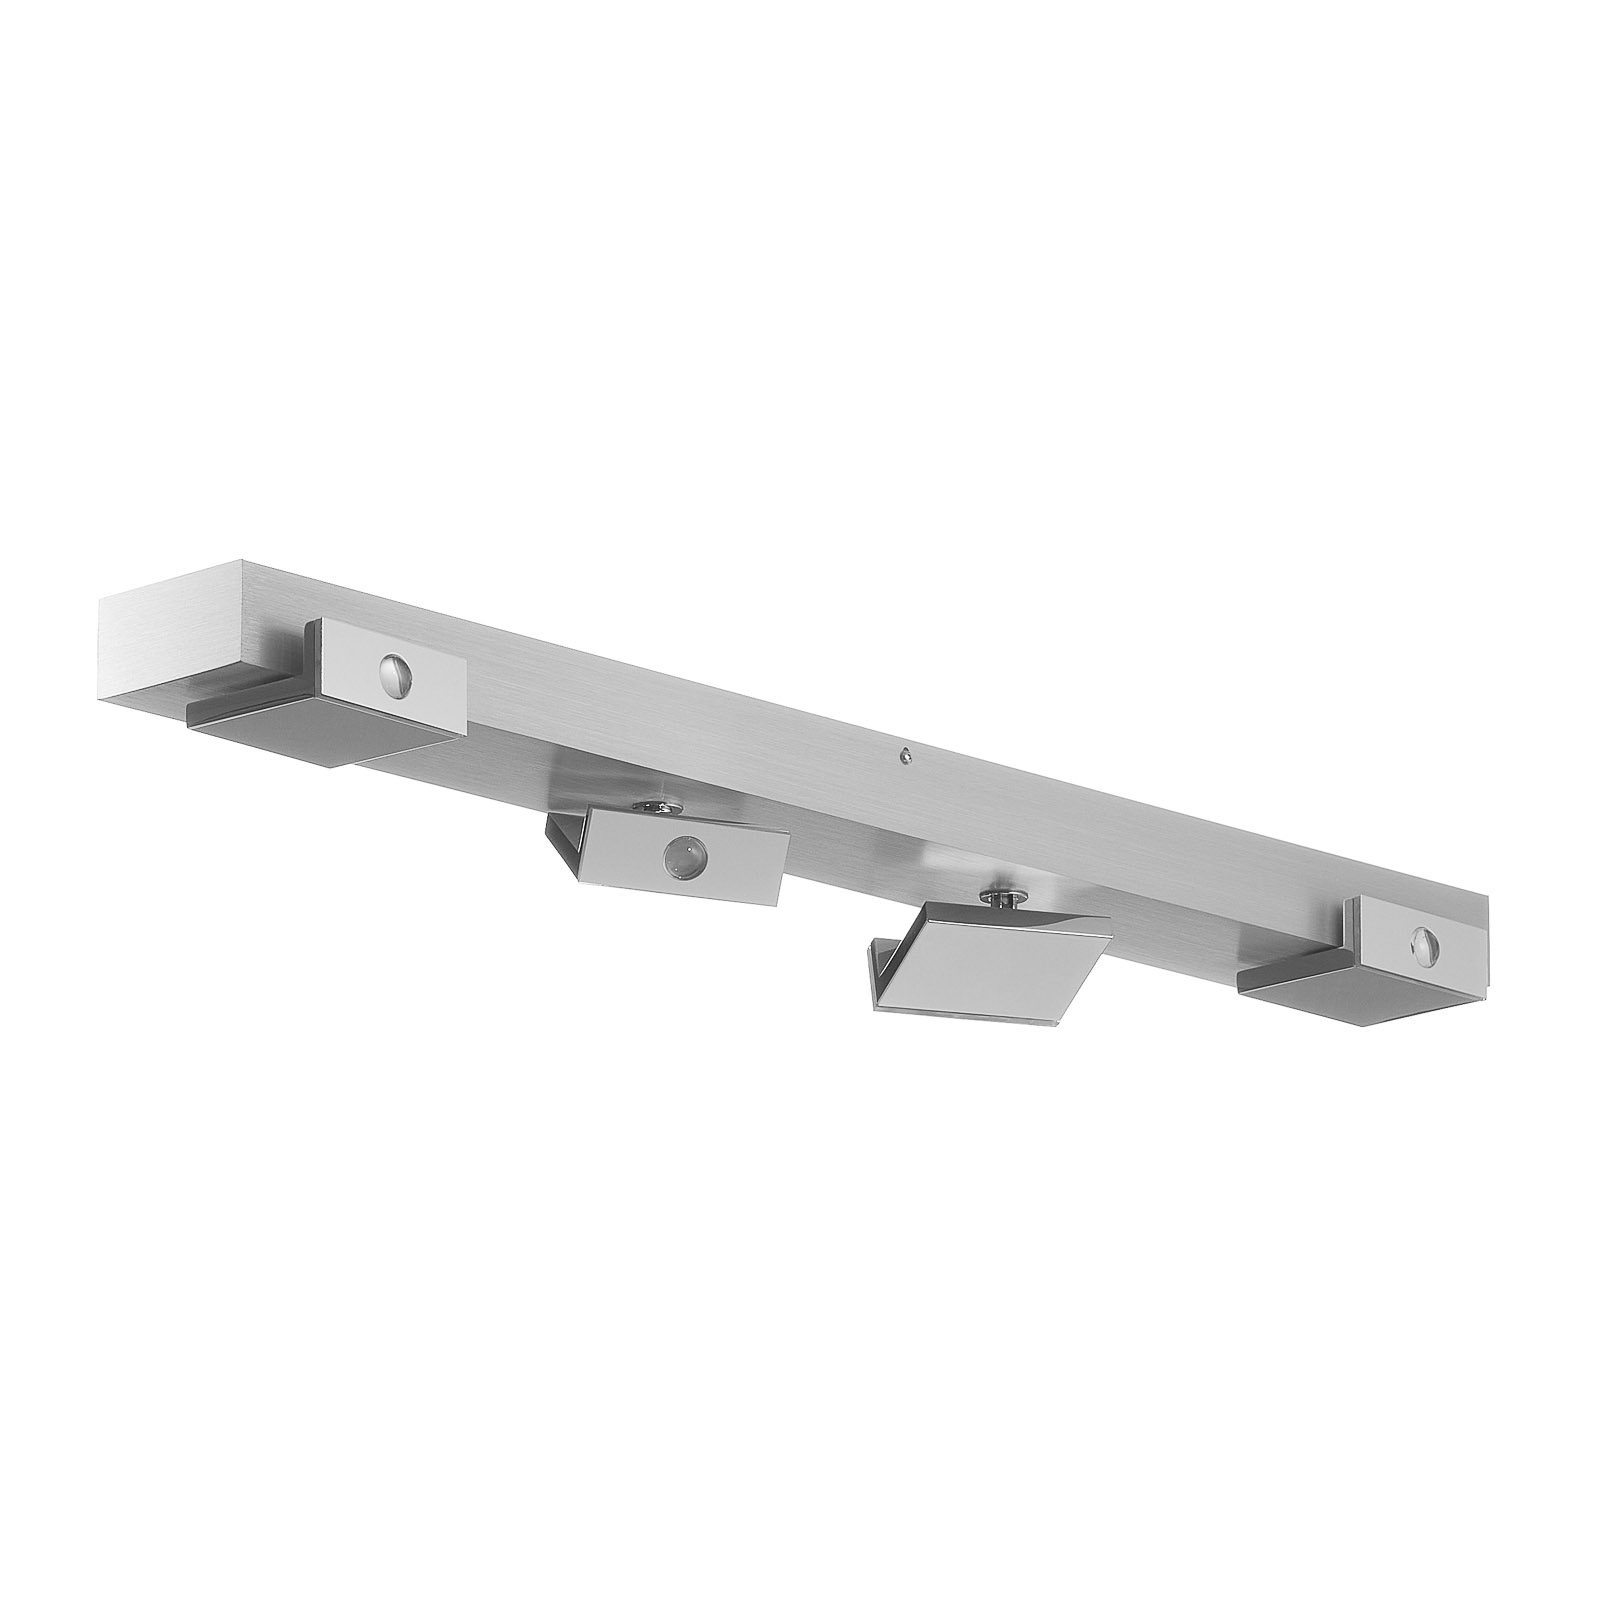 Elle - spot LED a 4 punti luce, dimmerabile